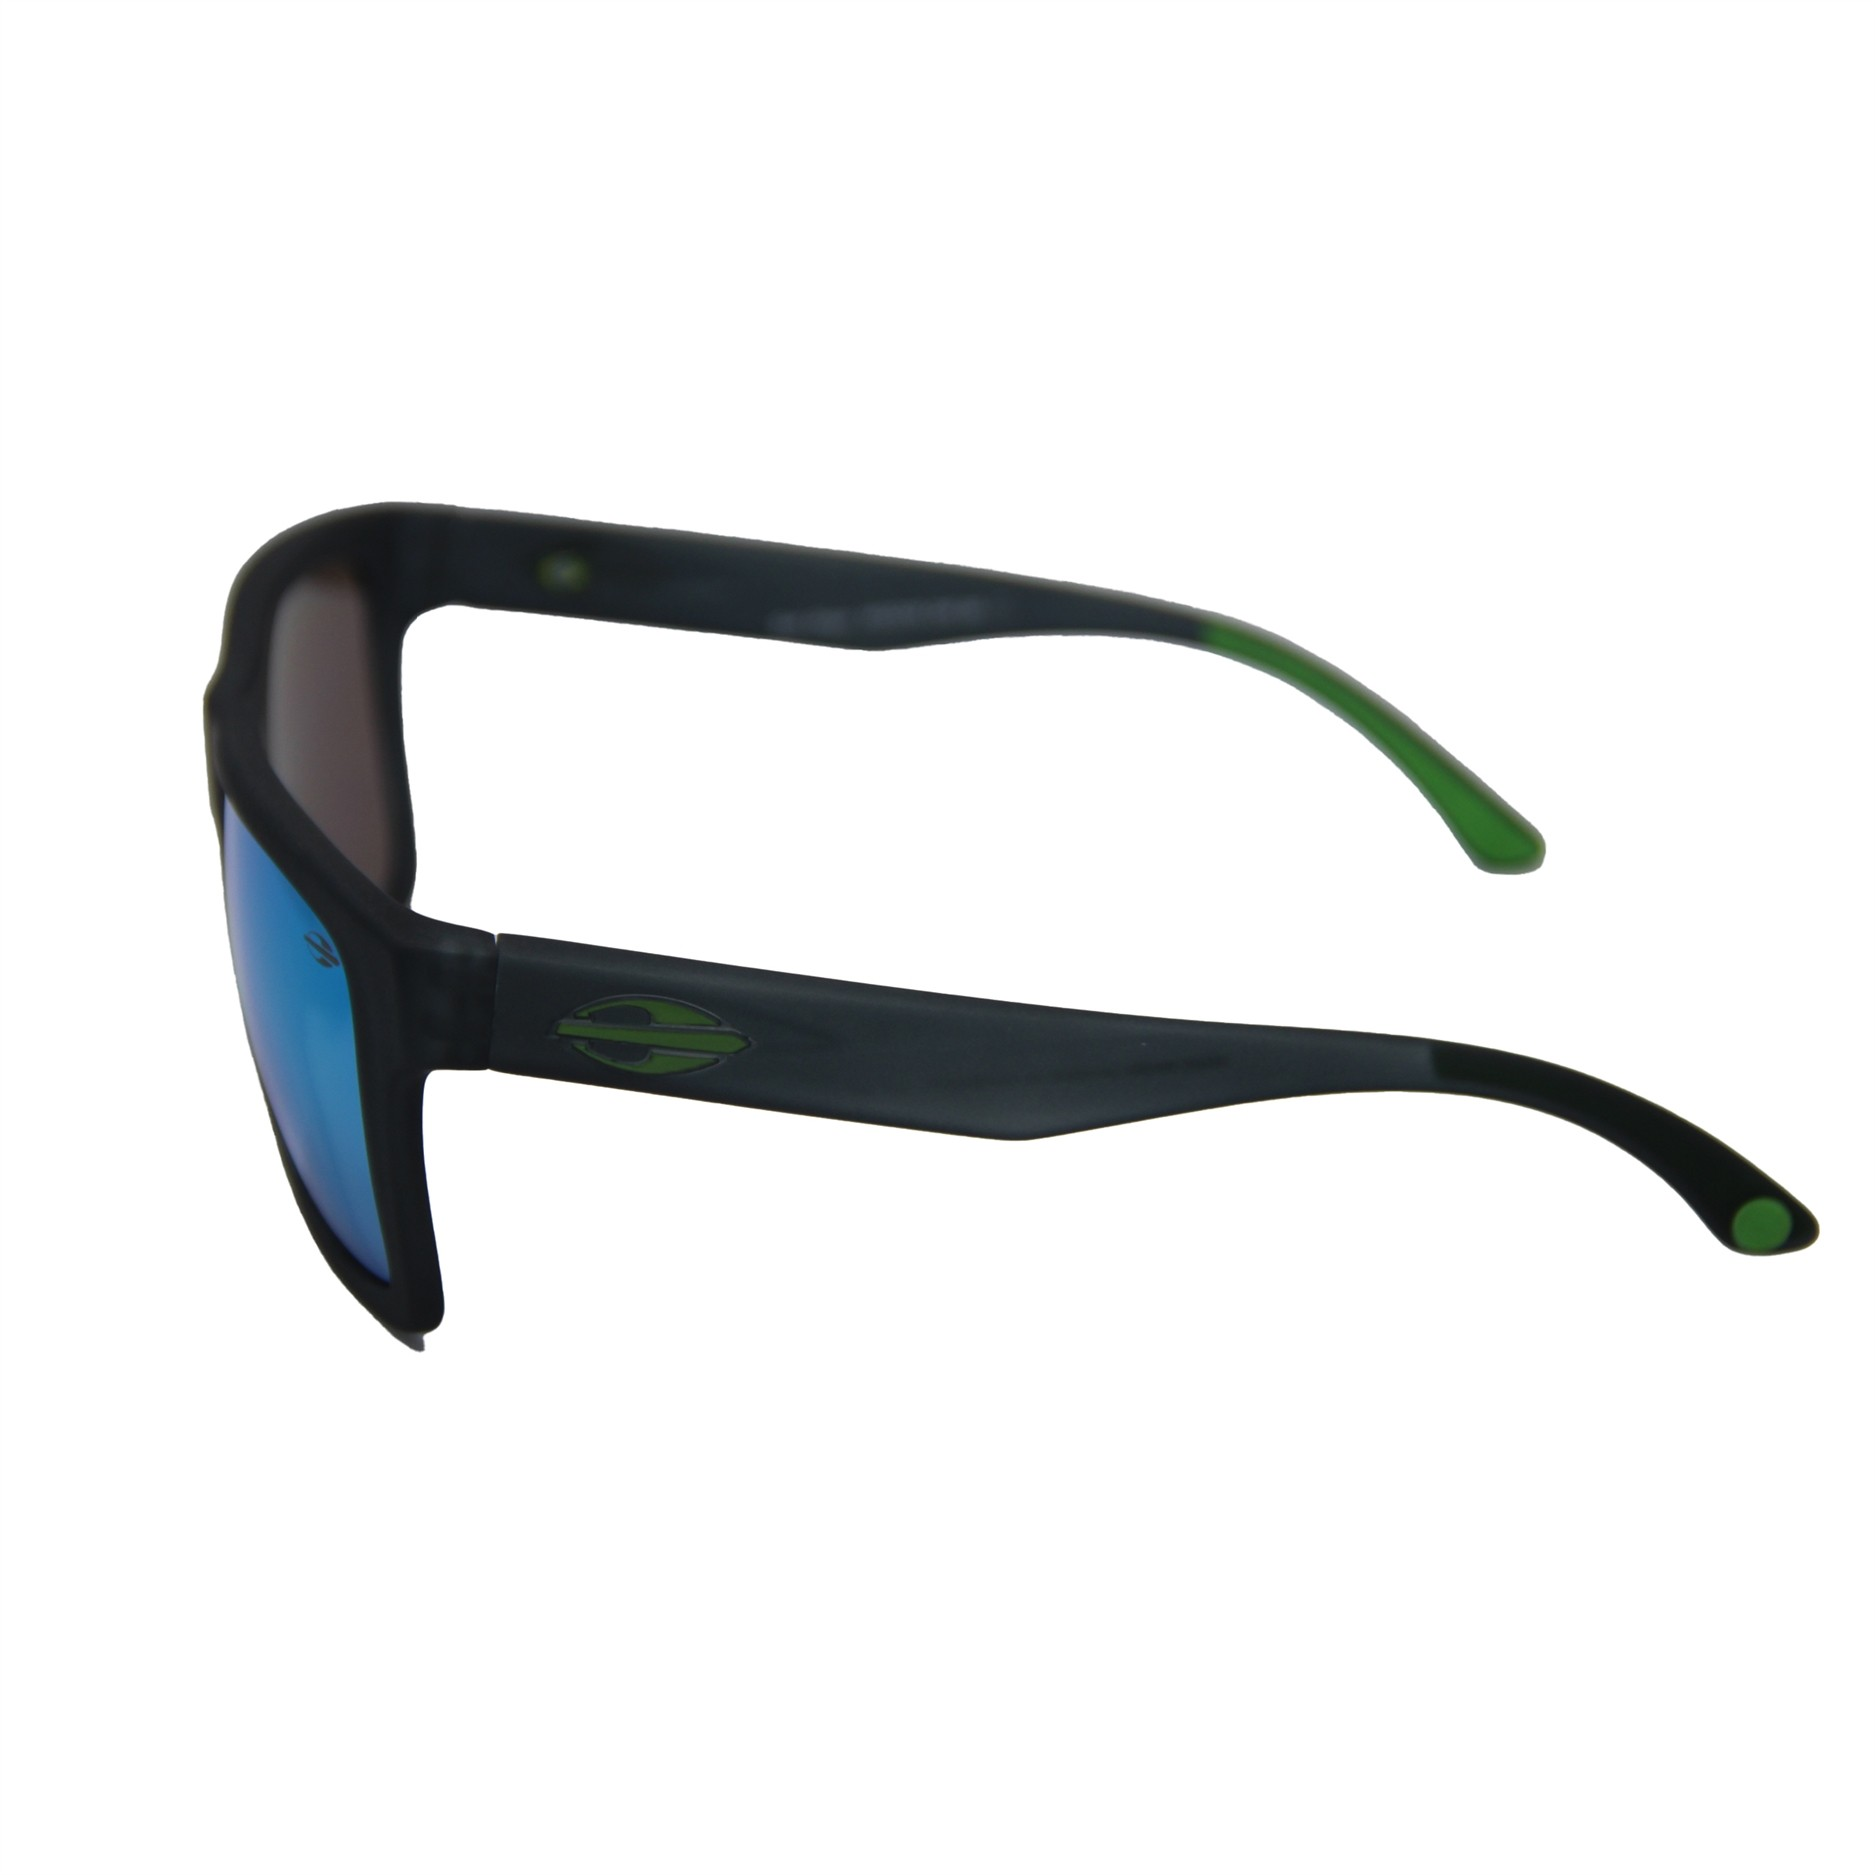 Oculos Solar Mormaii San Diego - Cod. M0009d1985 - Cinza/verde - Lente Verde ESPELHADO